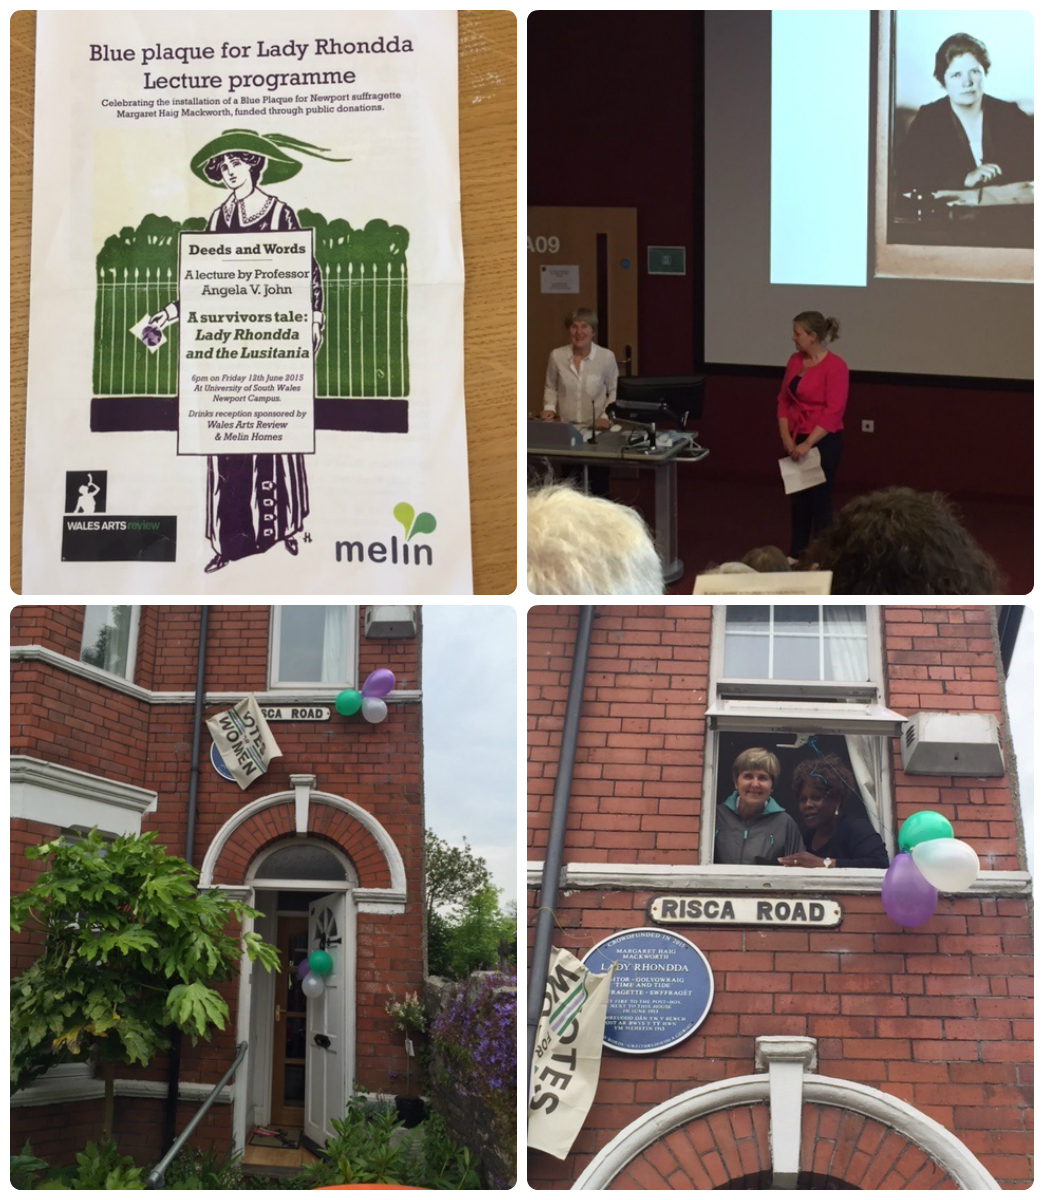 Lady_Rhondda_plaque_and_celebrations.jpg